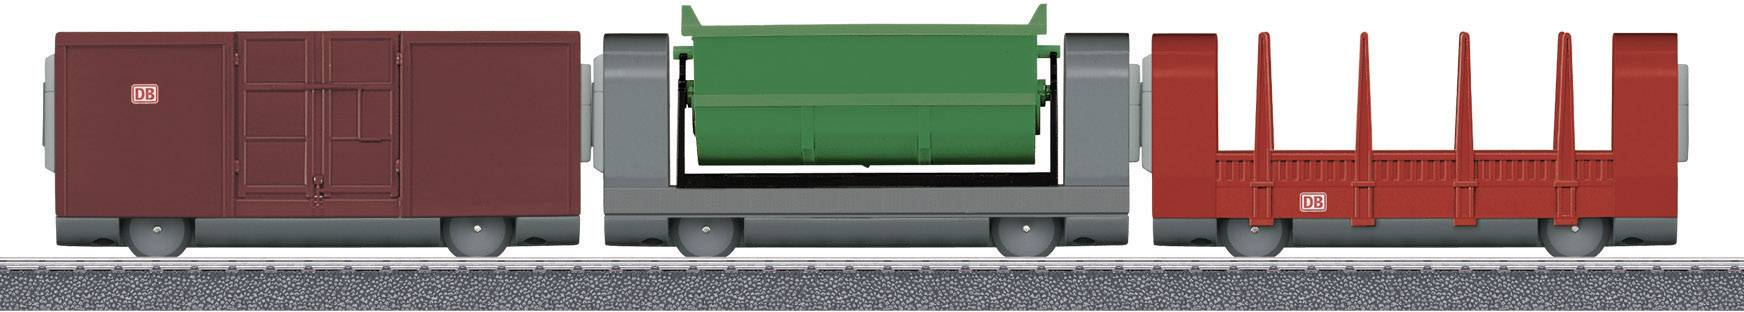 H0 nákladné vagóny, model Märklin World 44100